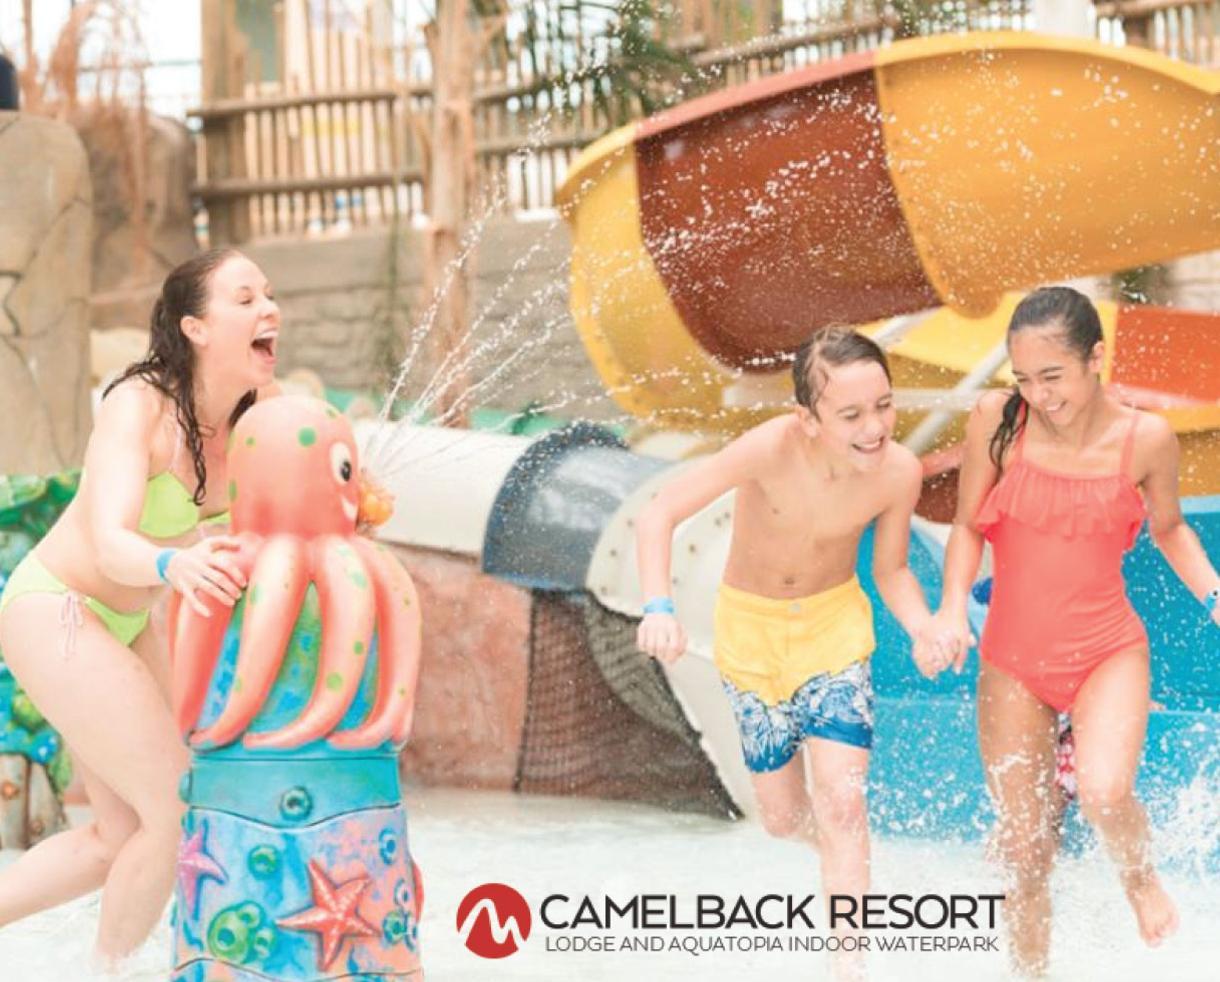 Camelback Lodge & Aquatopia Indoor Waterpark Getaway